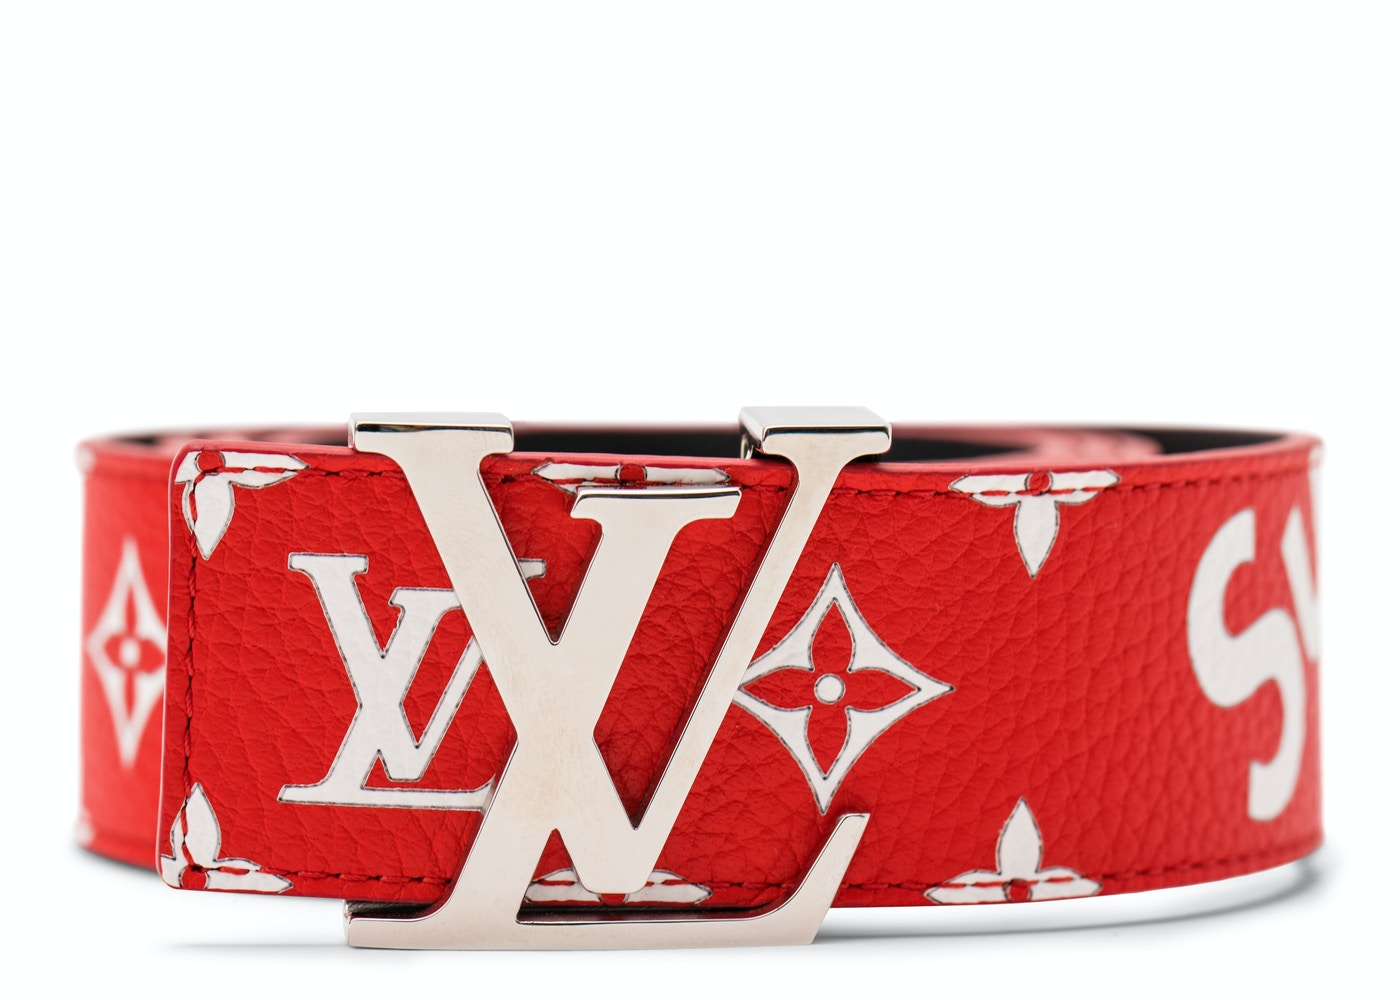 046f4640712 Louis Vuitton x Supreme Initiales Belt 40 MM Monogram Red